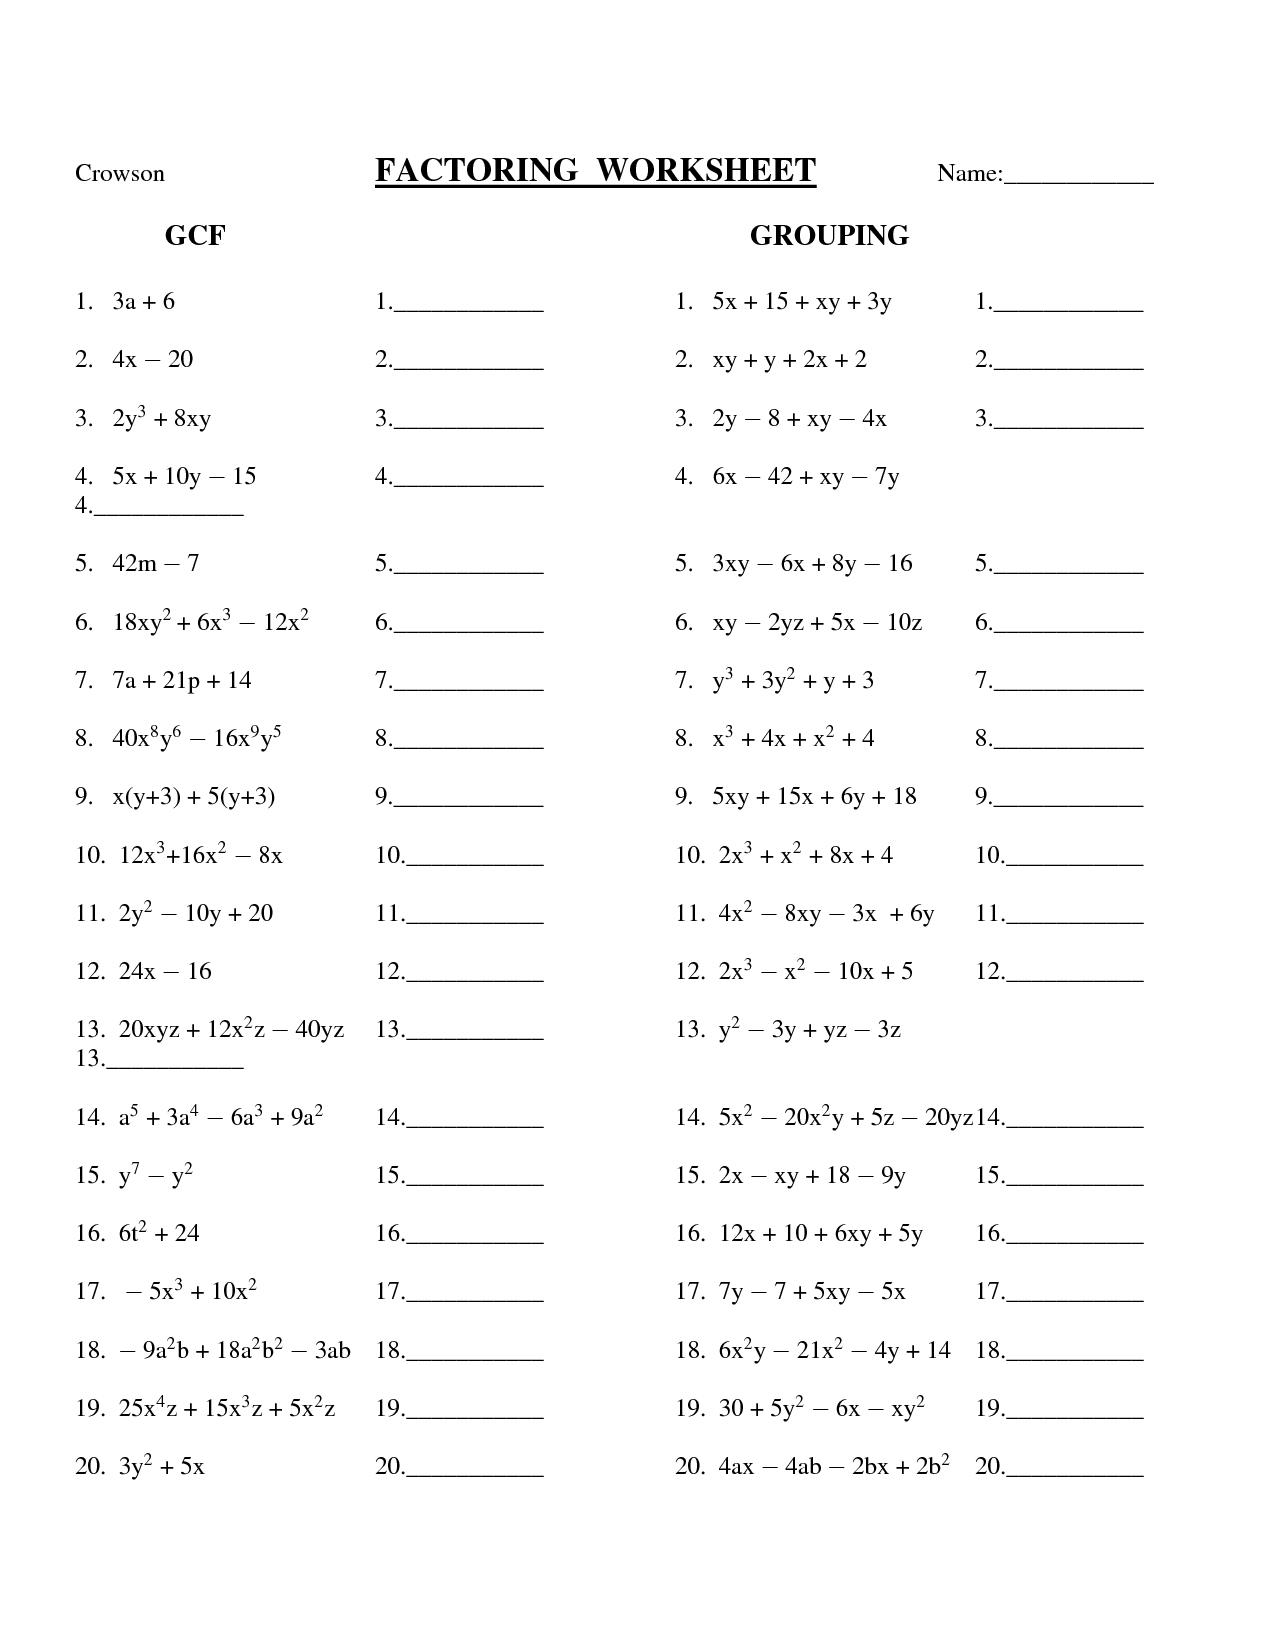 Greatest Mon Factors Worksheet